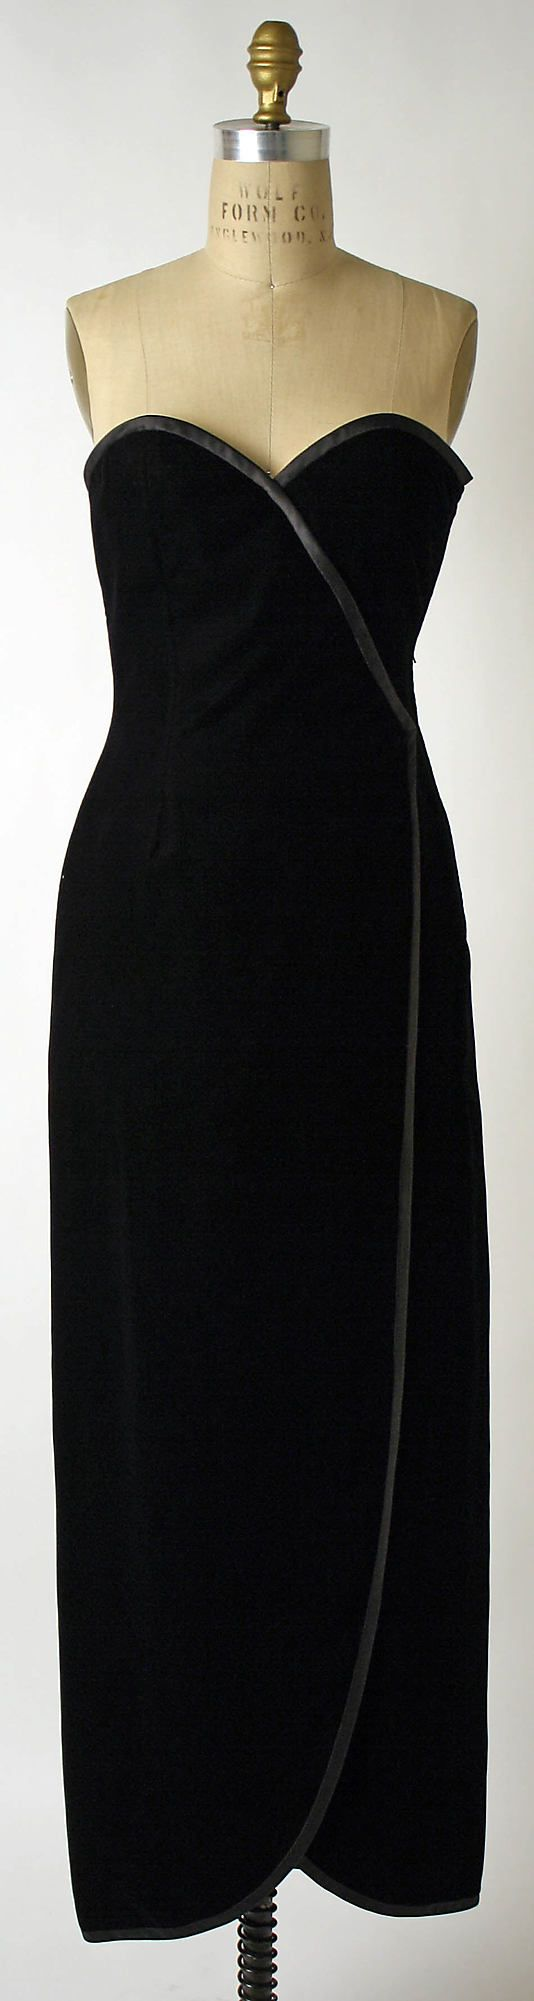 Evening dress.  Yves Saint Laurent, Paris  (French, founded 1962) (born Algeria) Oran 1936–2008 Paris)  Date: fall/winter 1984–85  French. silk